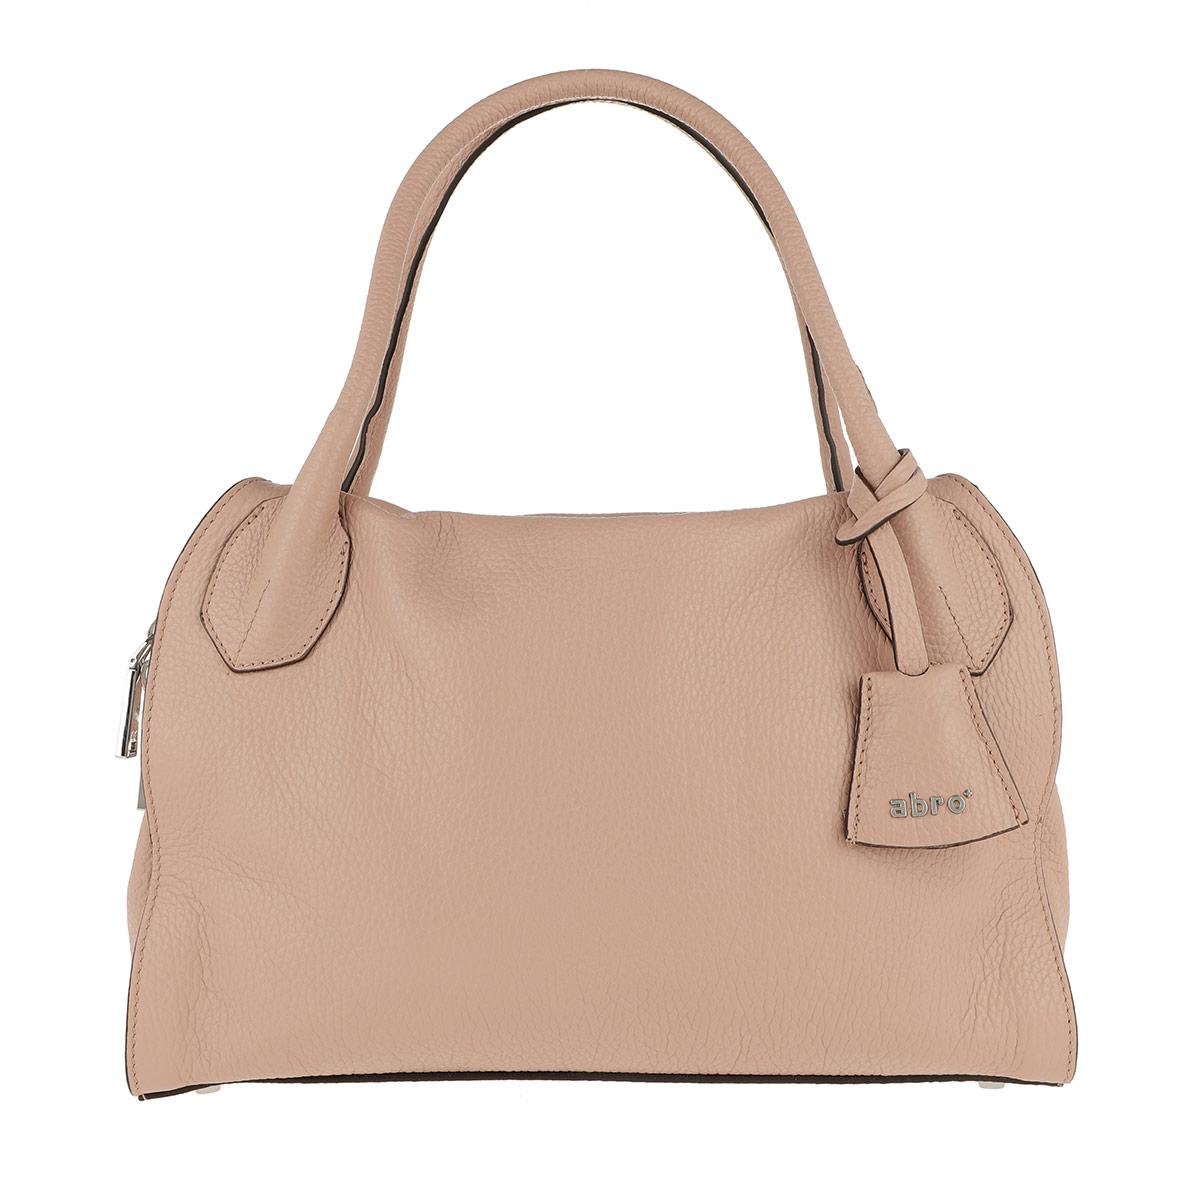 Abro Tote - Adria Shoulder Bag Rosa - in rosa - für Damen